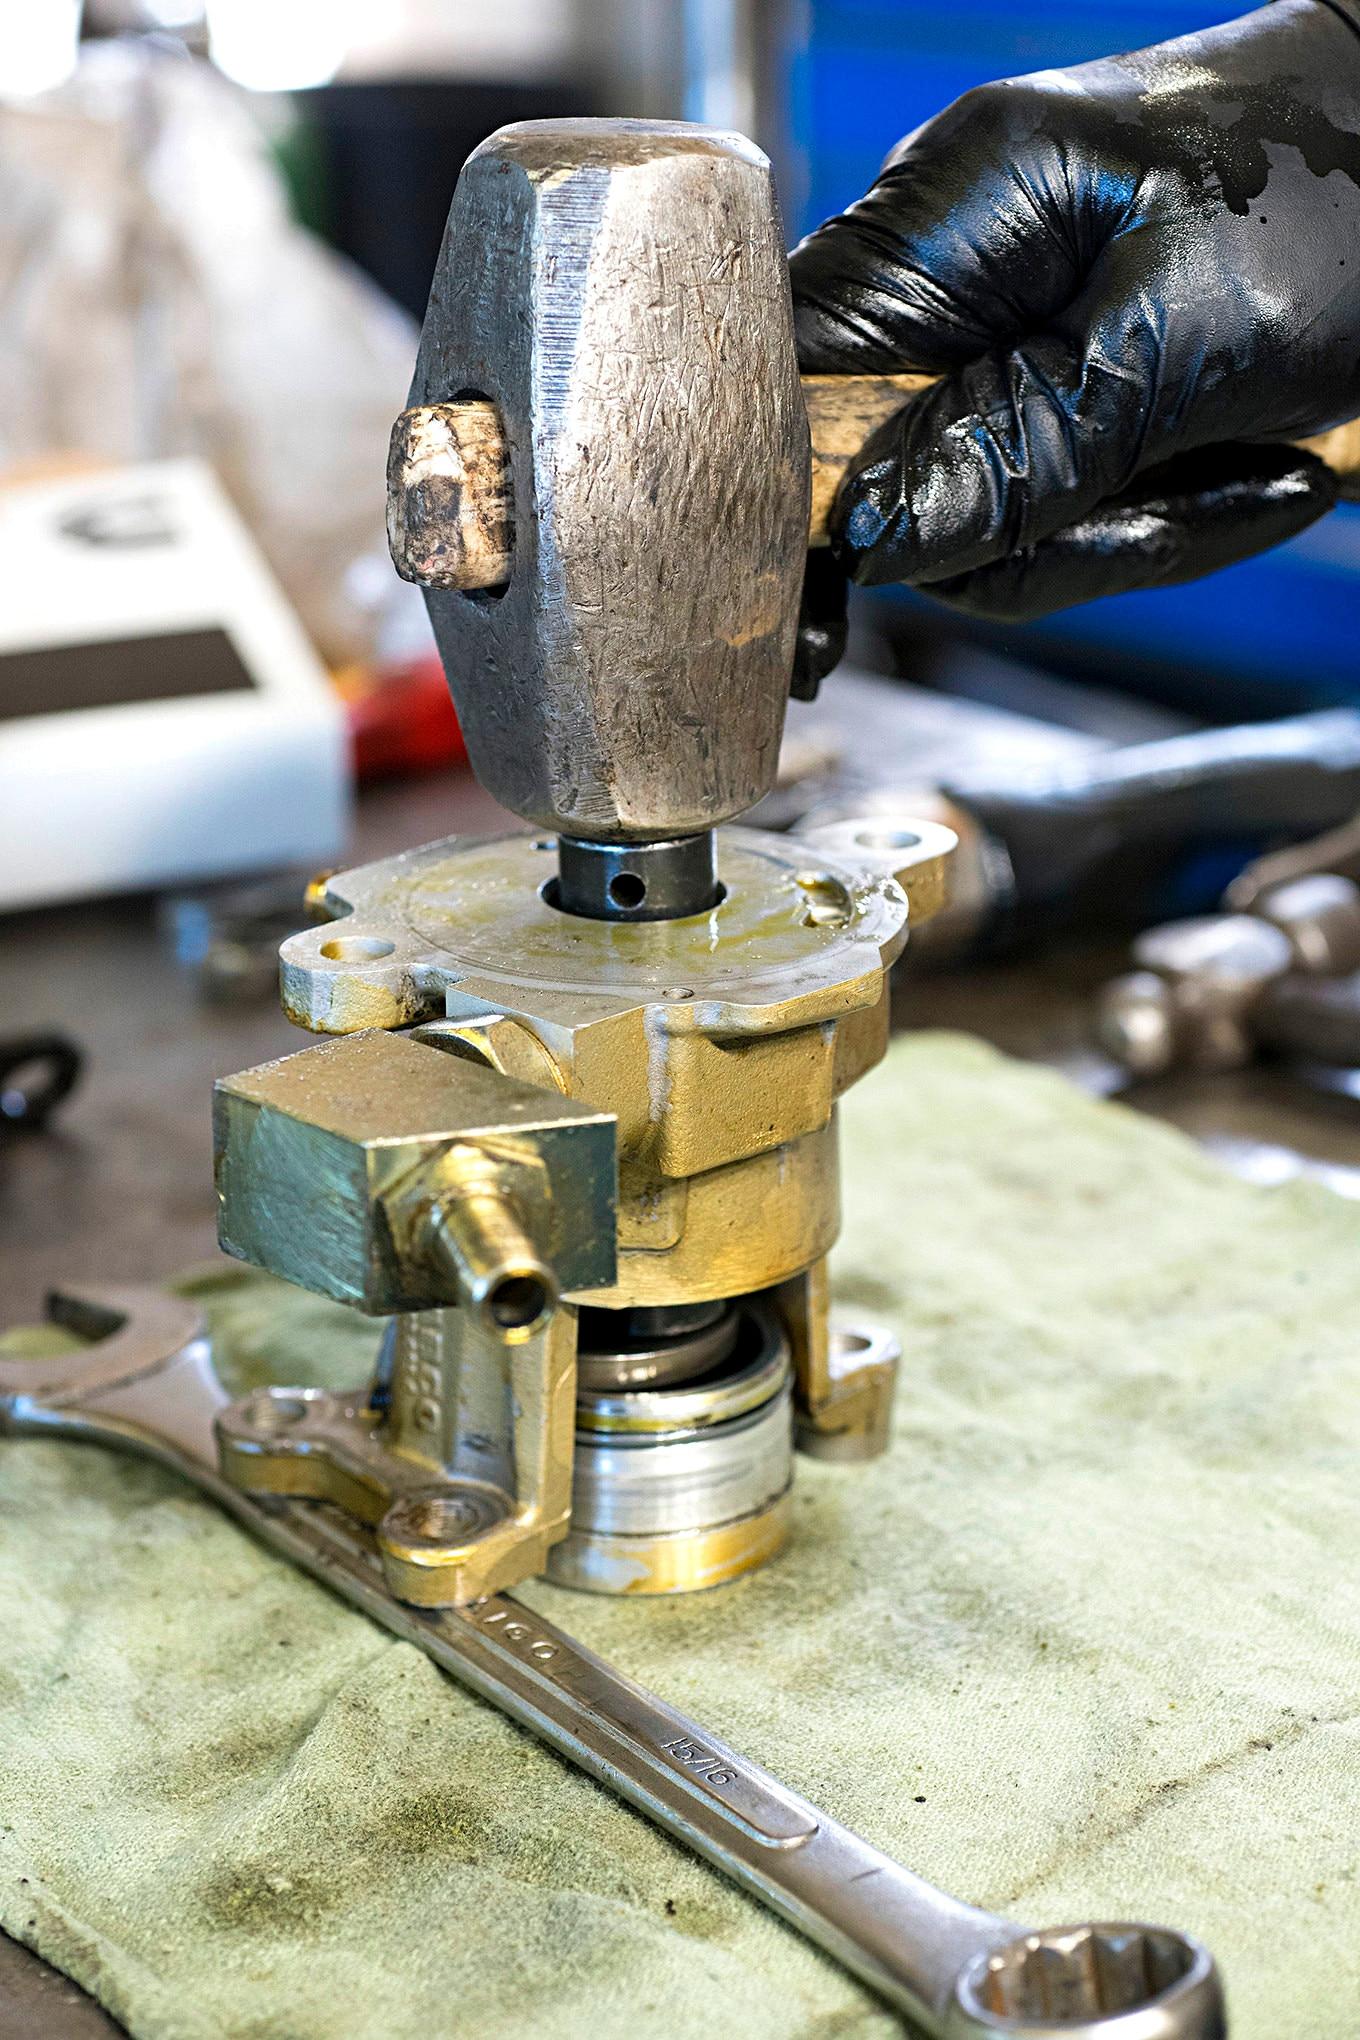 How to Repair Cummins 5.9L Vacuum Pump Oil Leak